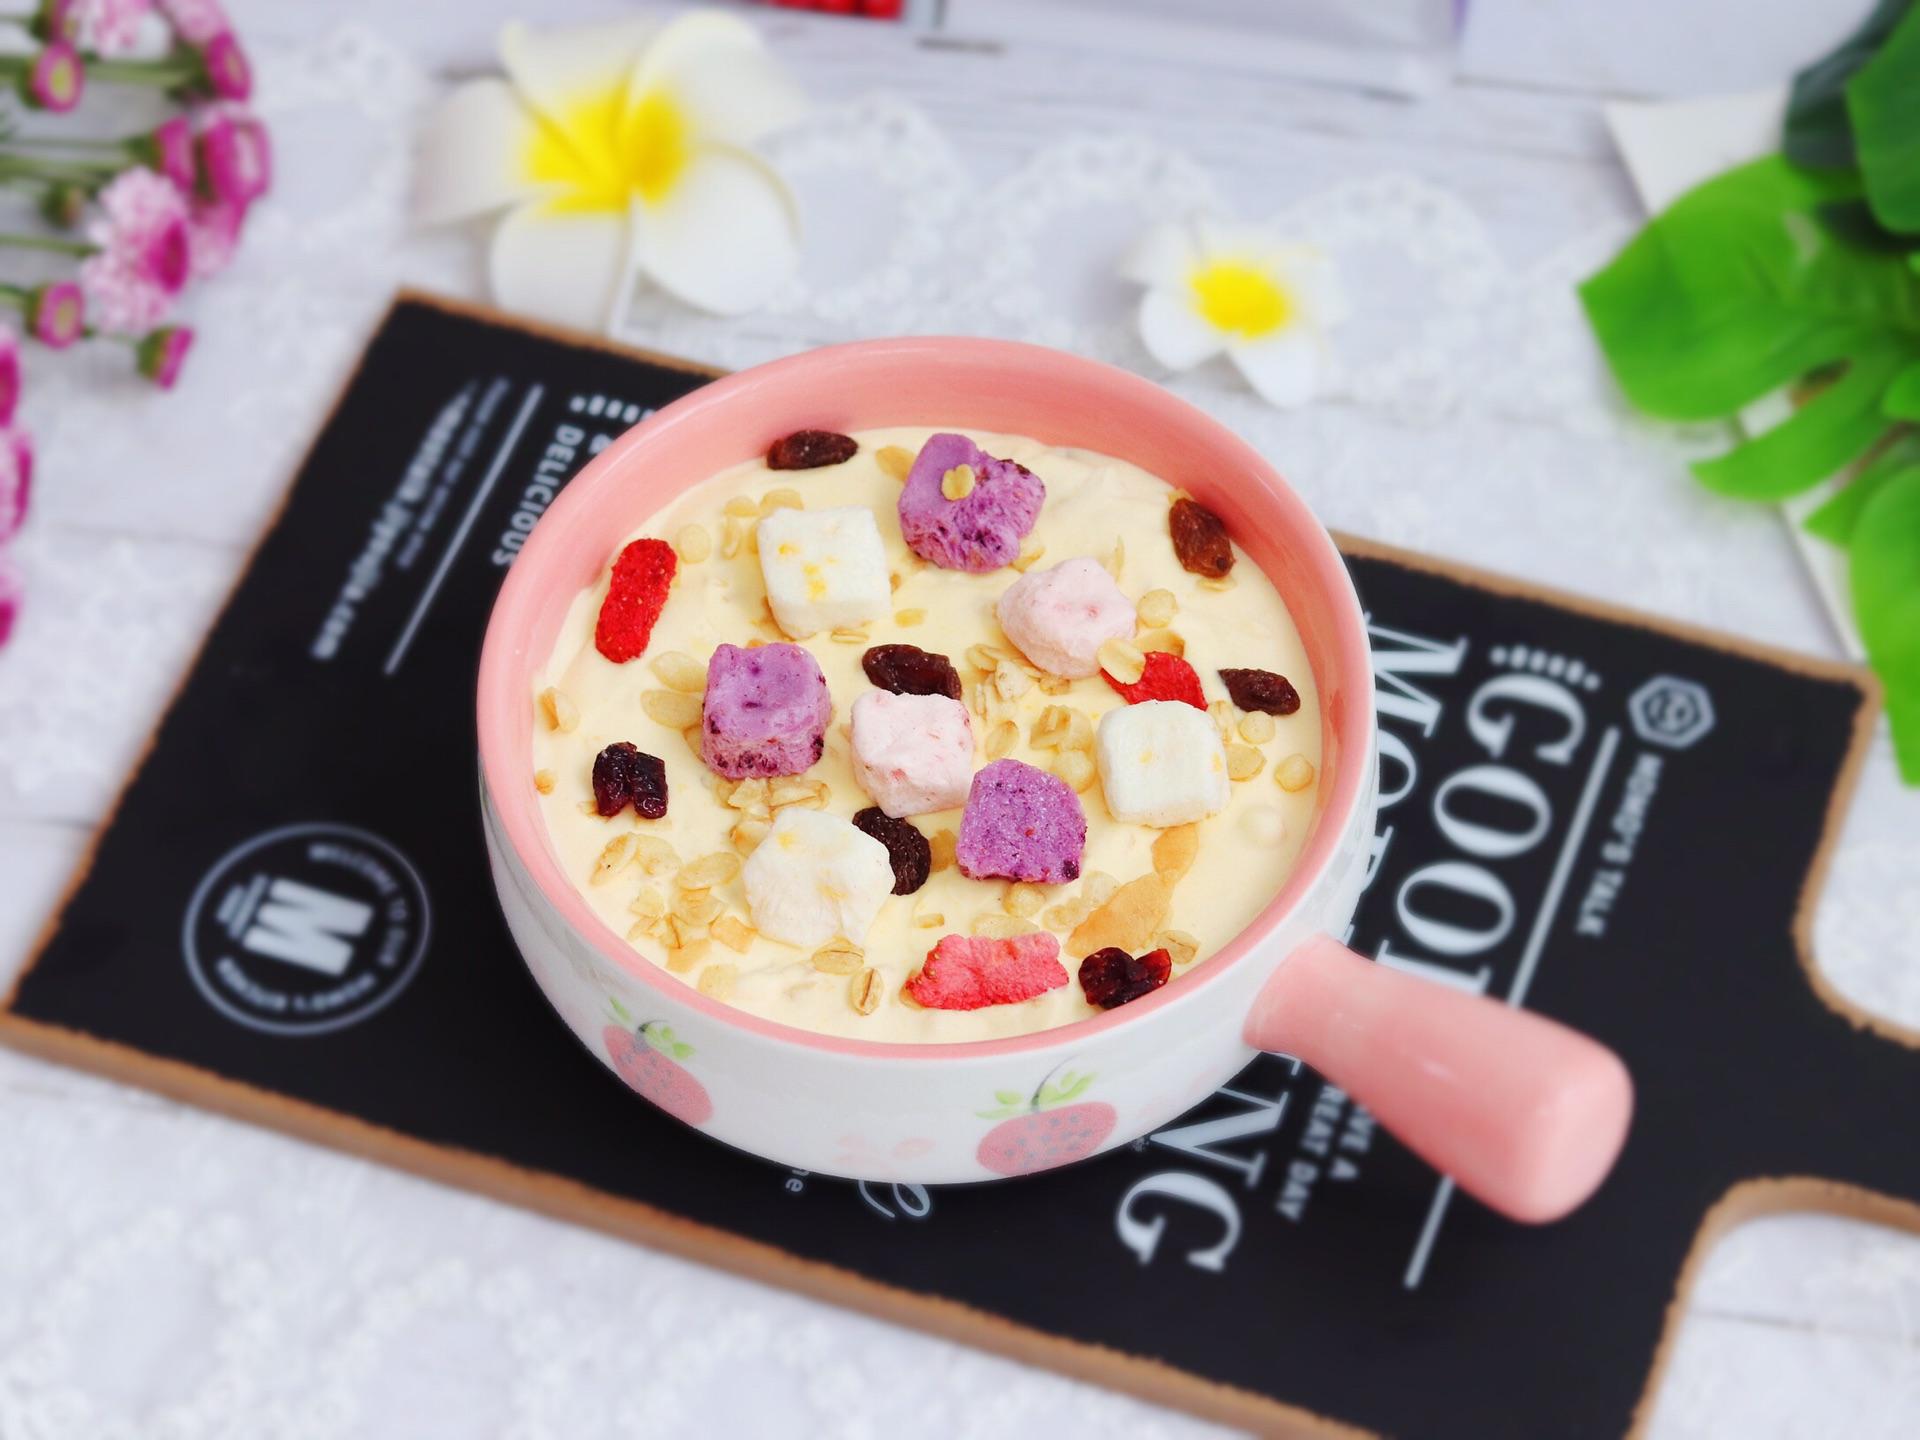 Roasted Sour Plum & Toasted Oat Ice Cream